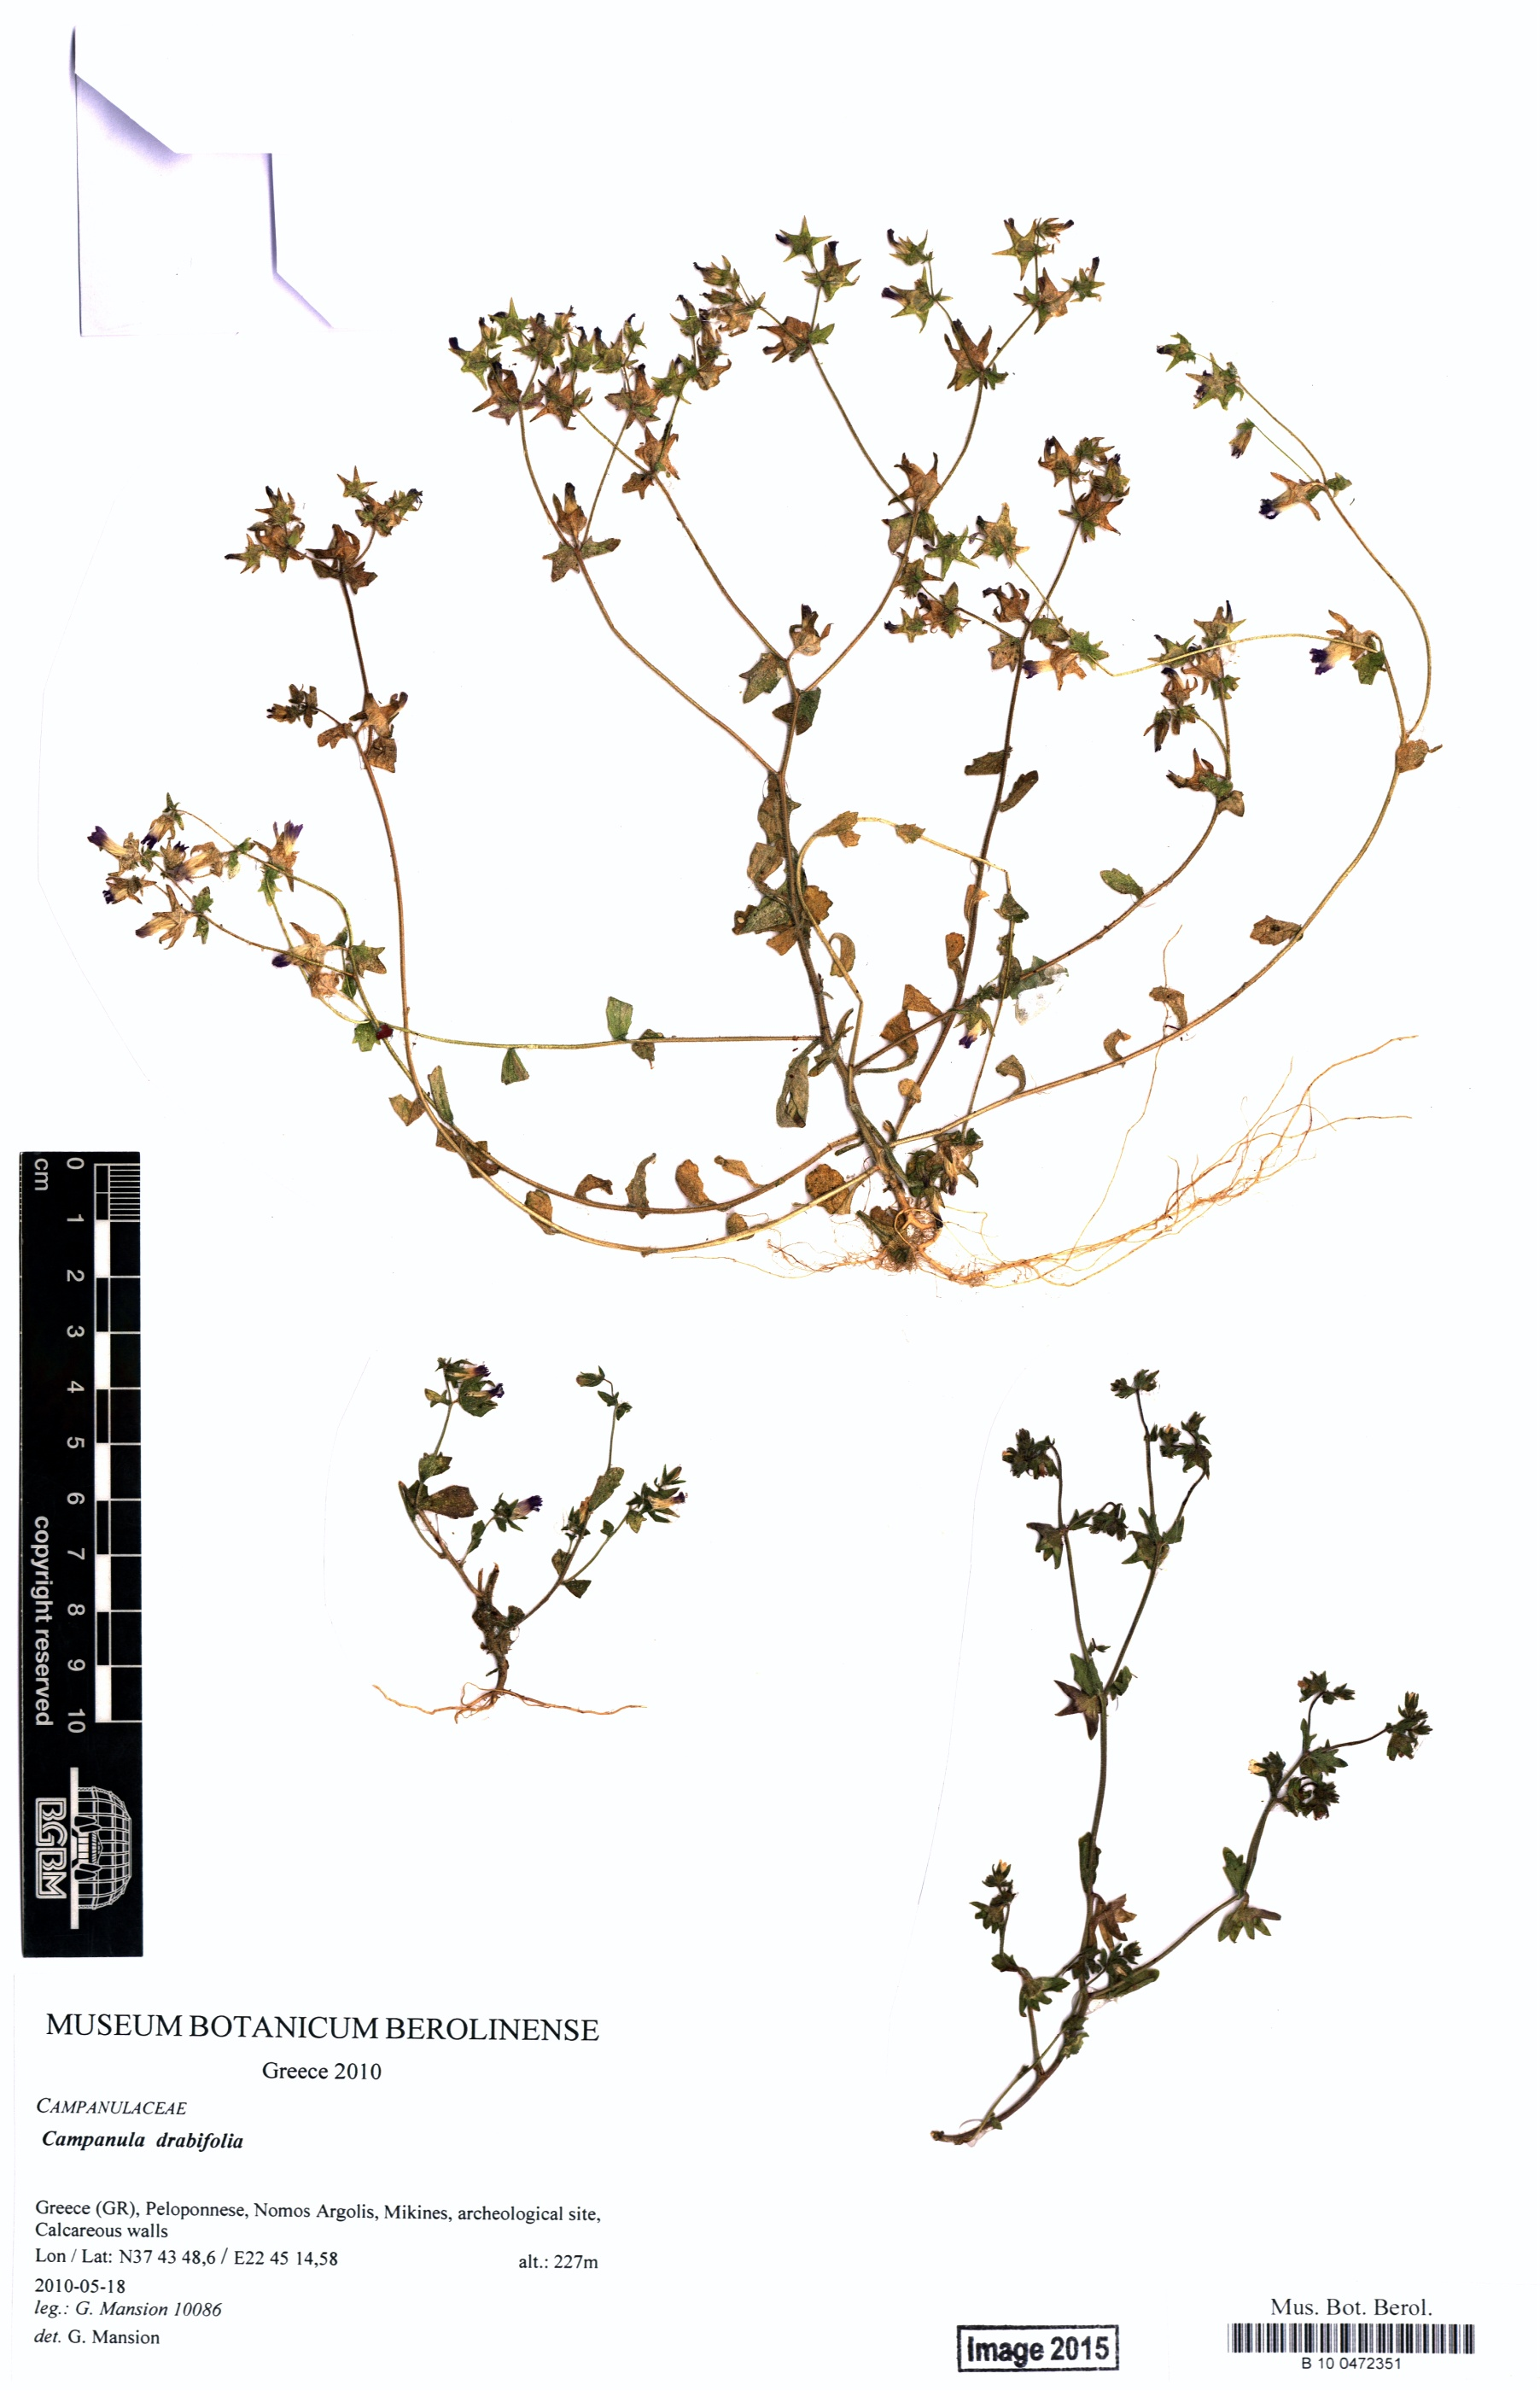 http://ww2.bgbm.org/herbarium/images/B/10/04/72/35/B_10_0472351.jpg